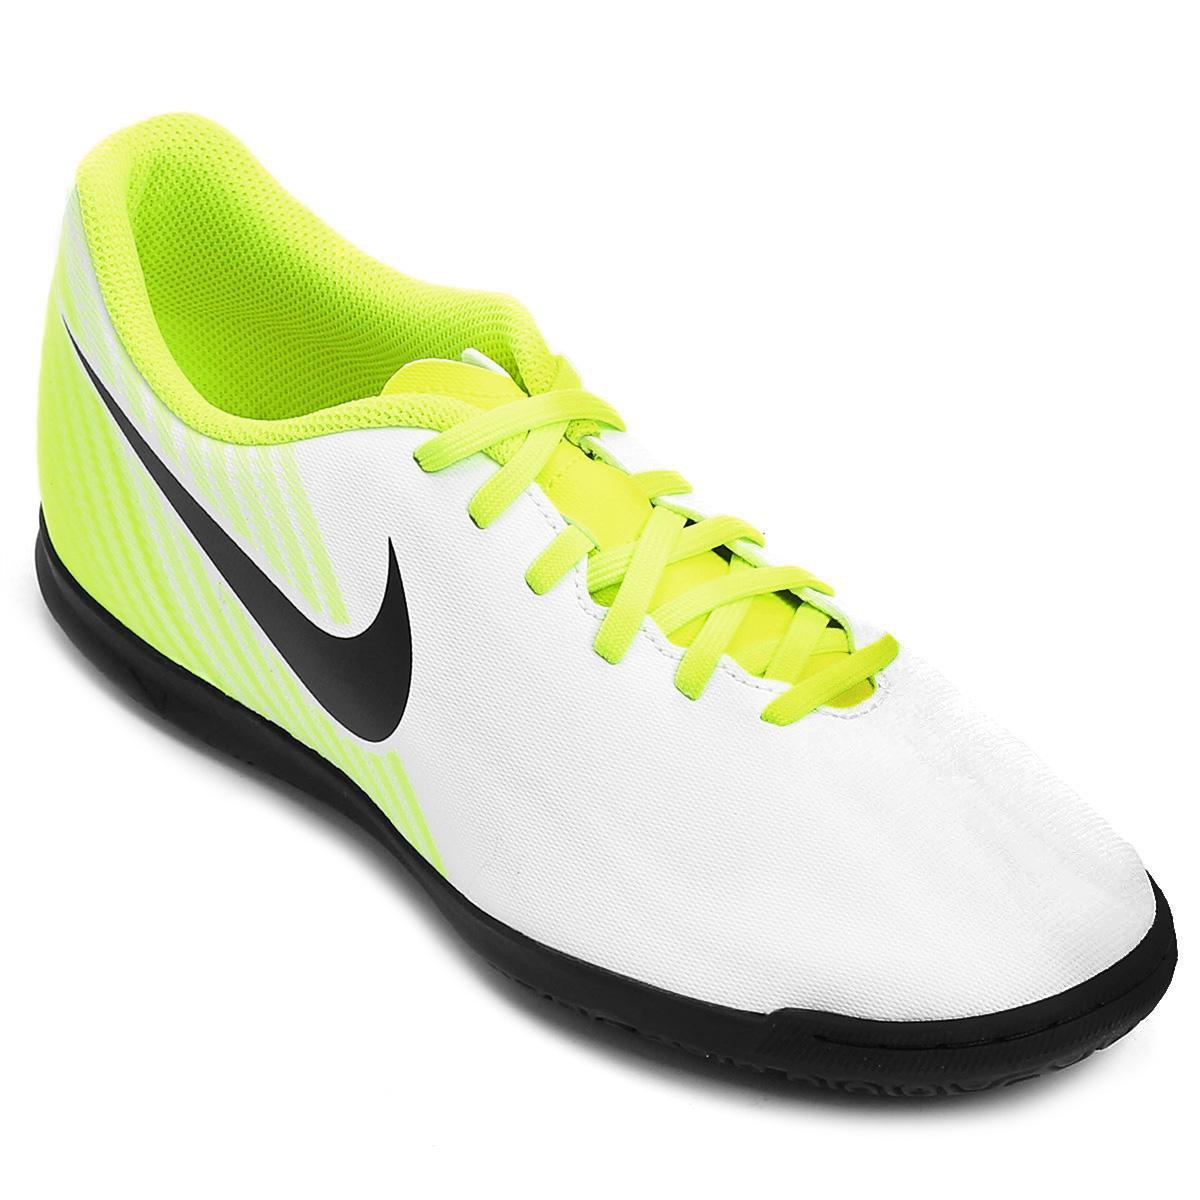 6aba2effbf157 Chuteira Futsal Nike Magista Ola II IC Masculina - Compre Agora ...